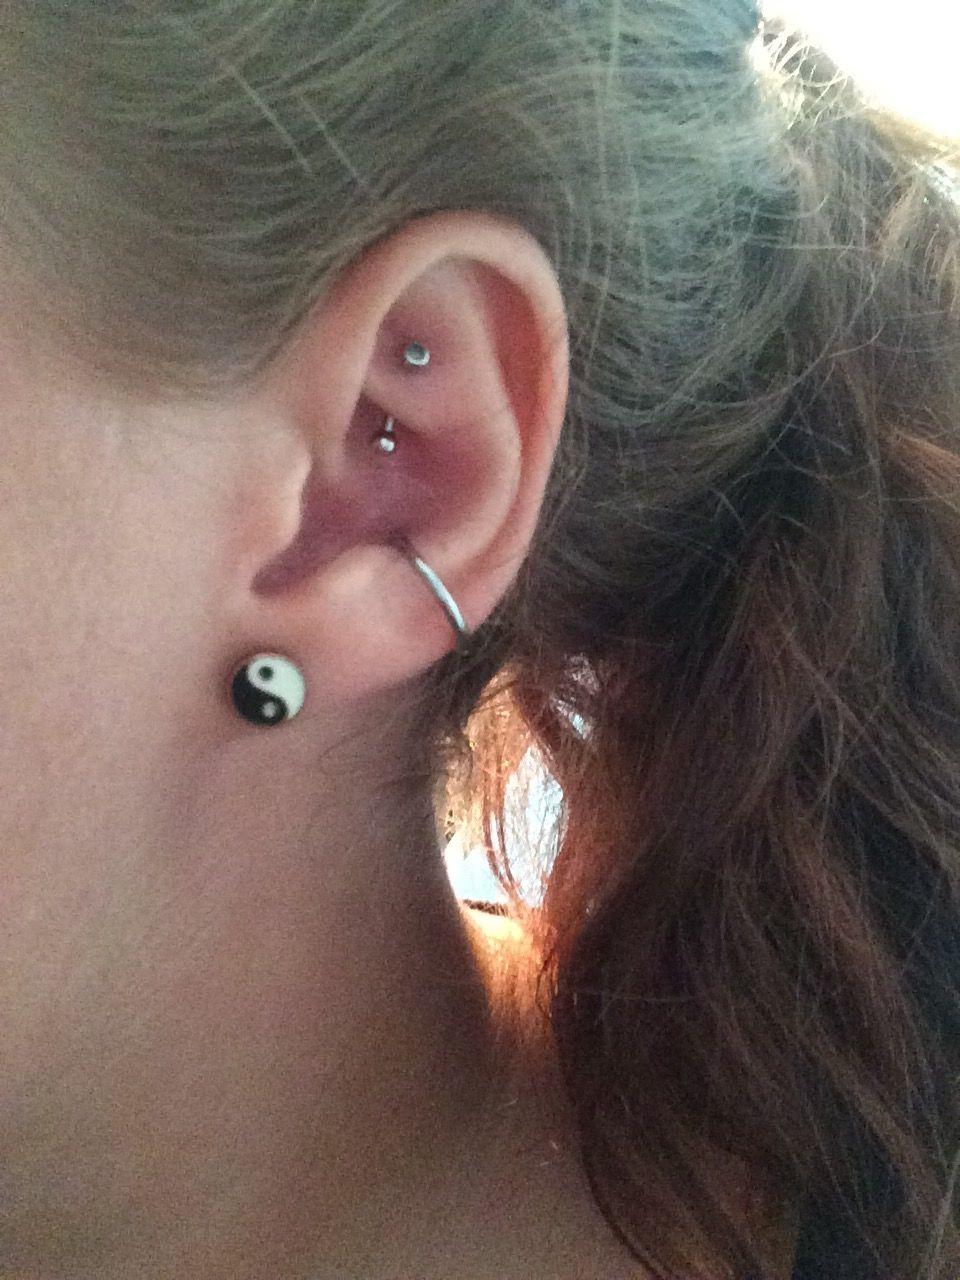 Bump under nose piercing  rook u conch piercings  peircings  Pinterest  Conch piercings